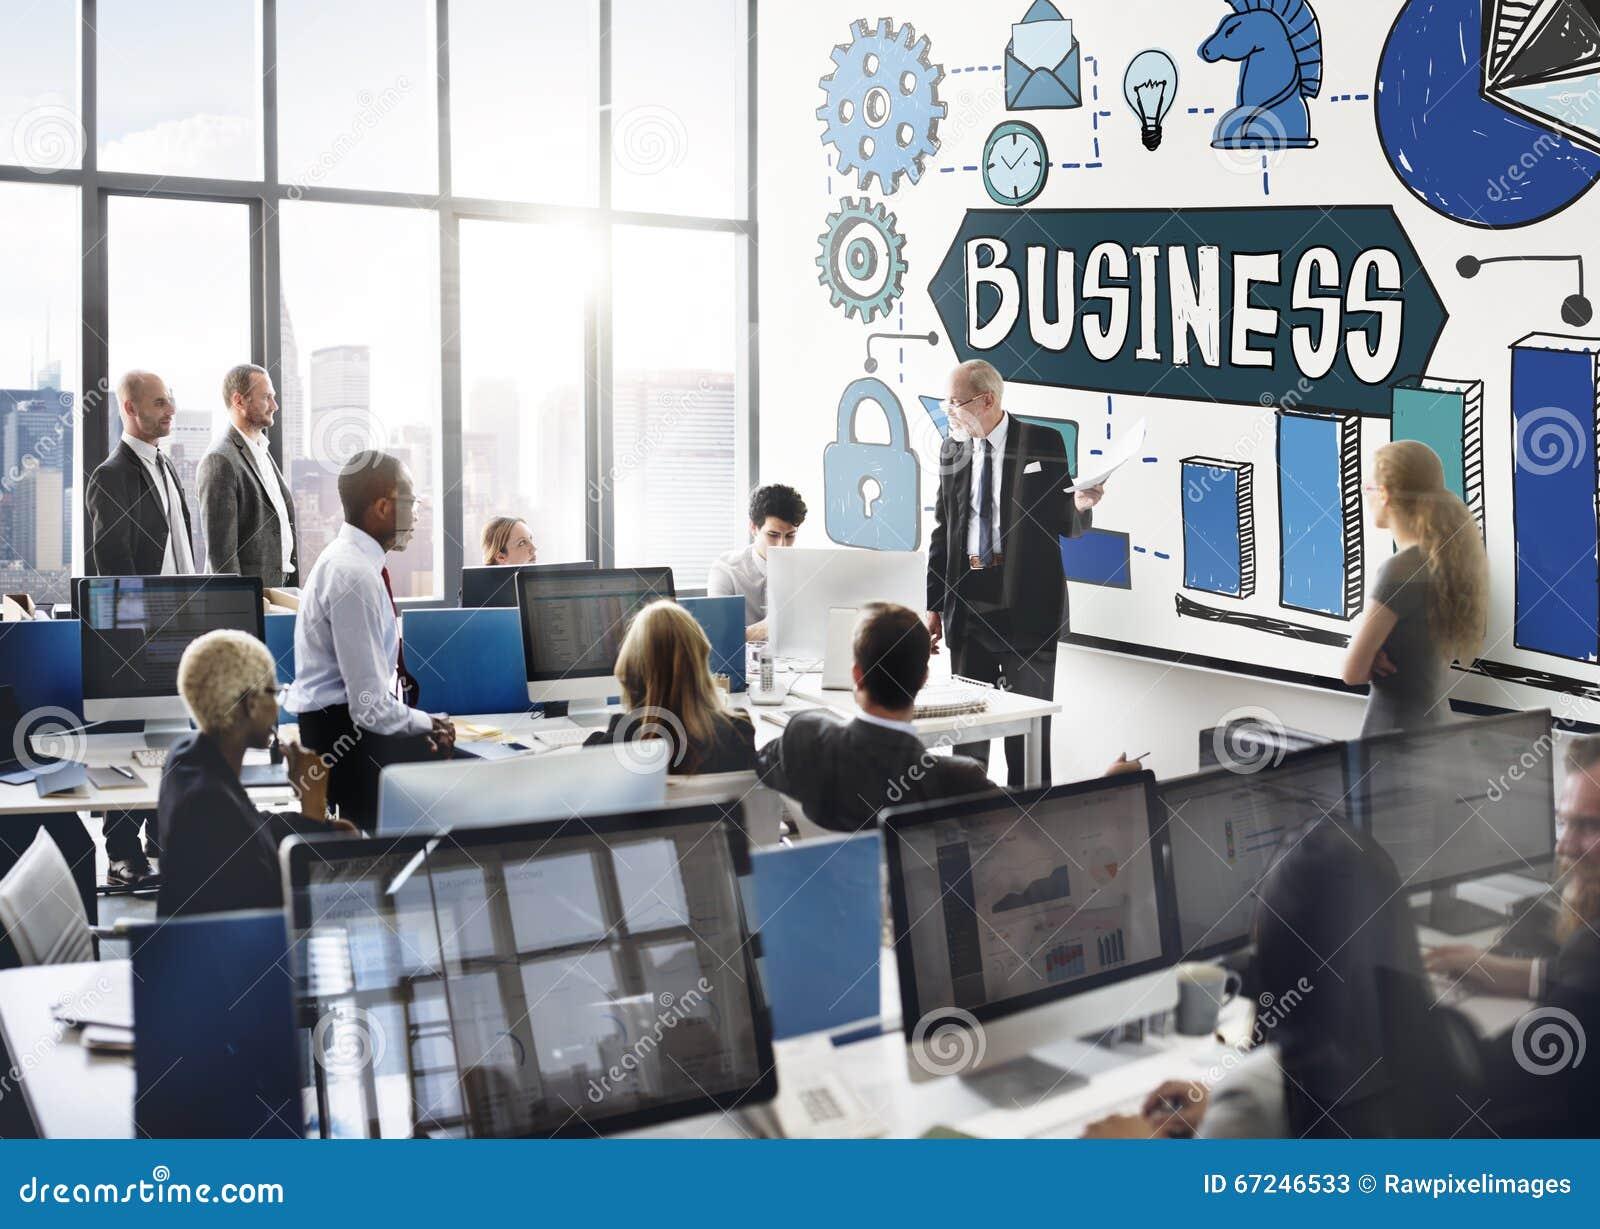 concept of organizational management